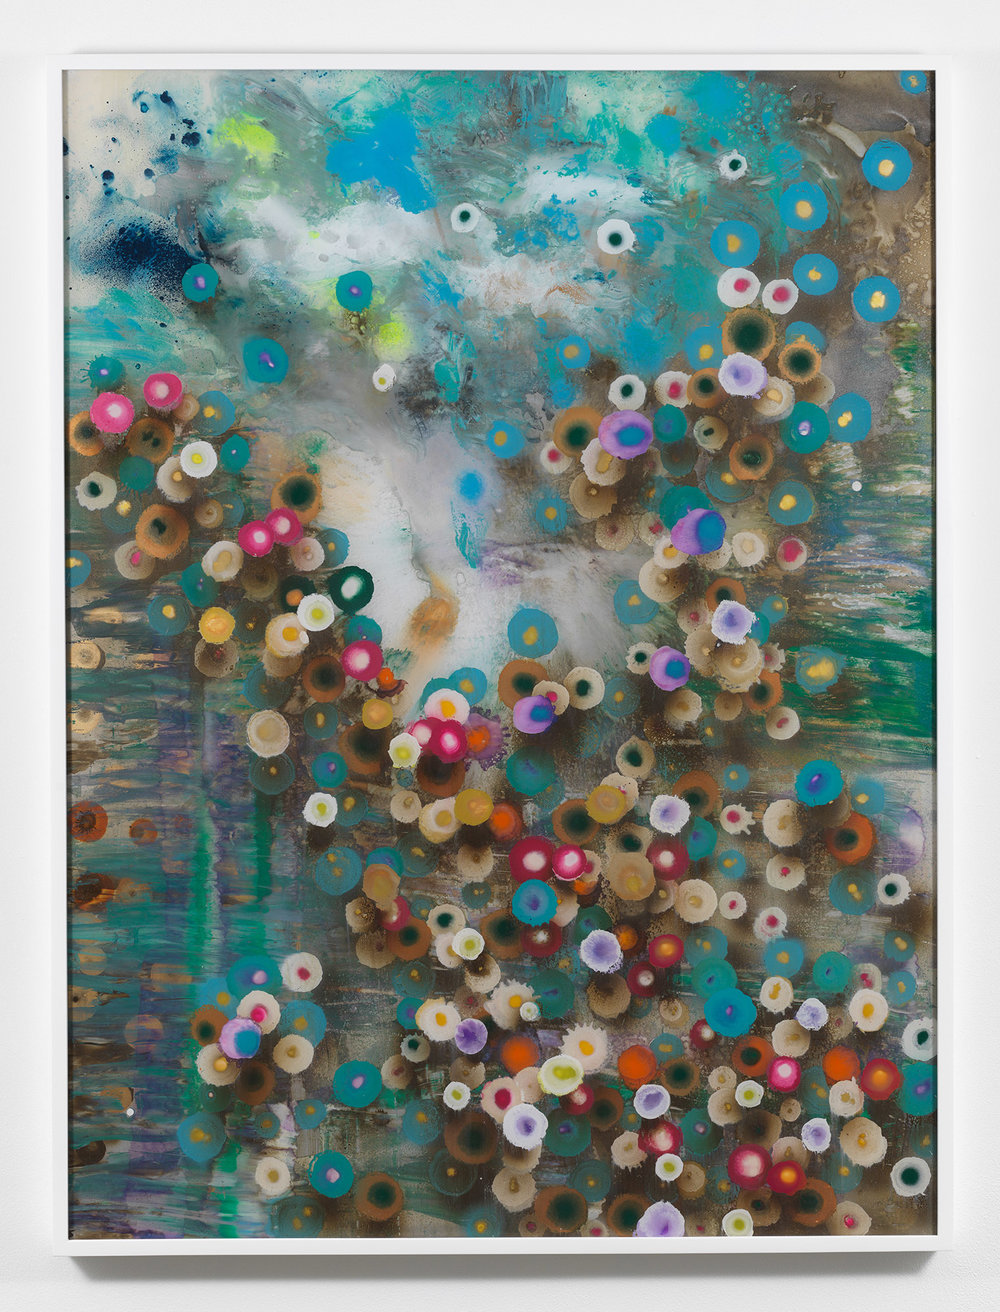 Giacinto Occhionero  Debris Landing , 2017 Spray paint on plexiglass 40 x 30 inches (101.6 x 76.2 cm)